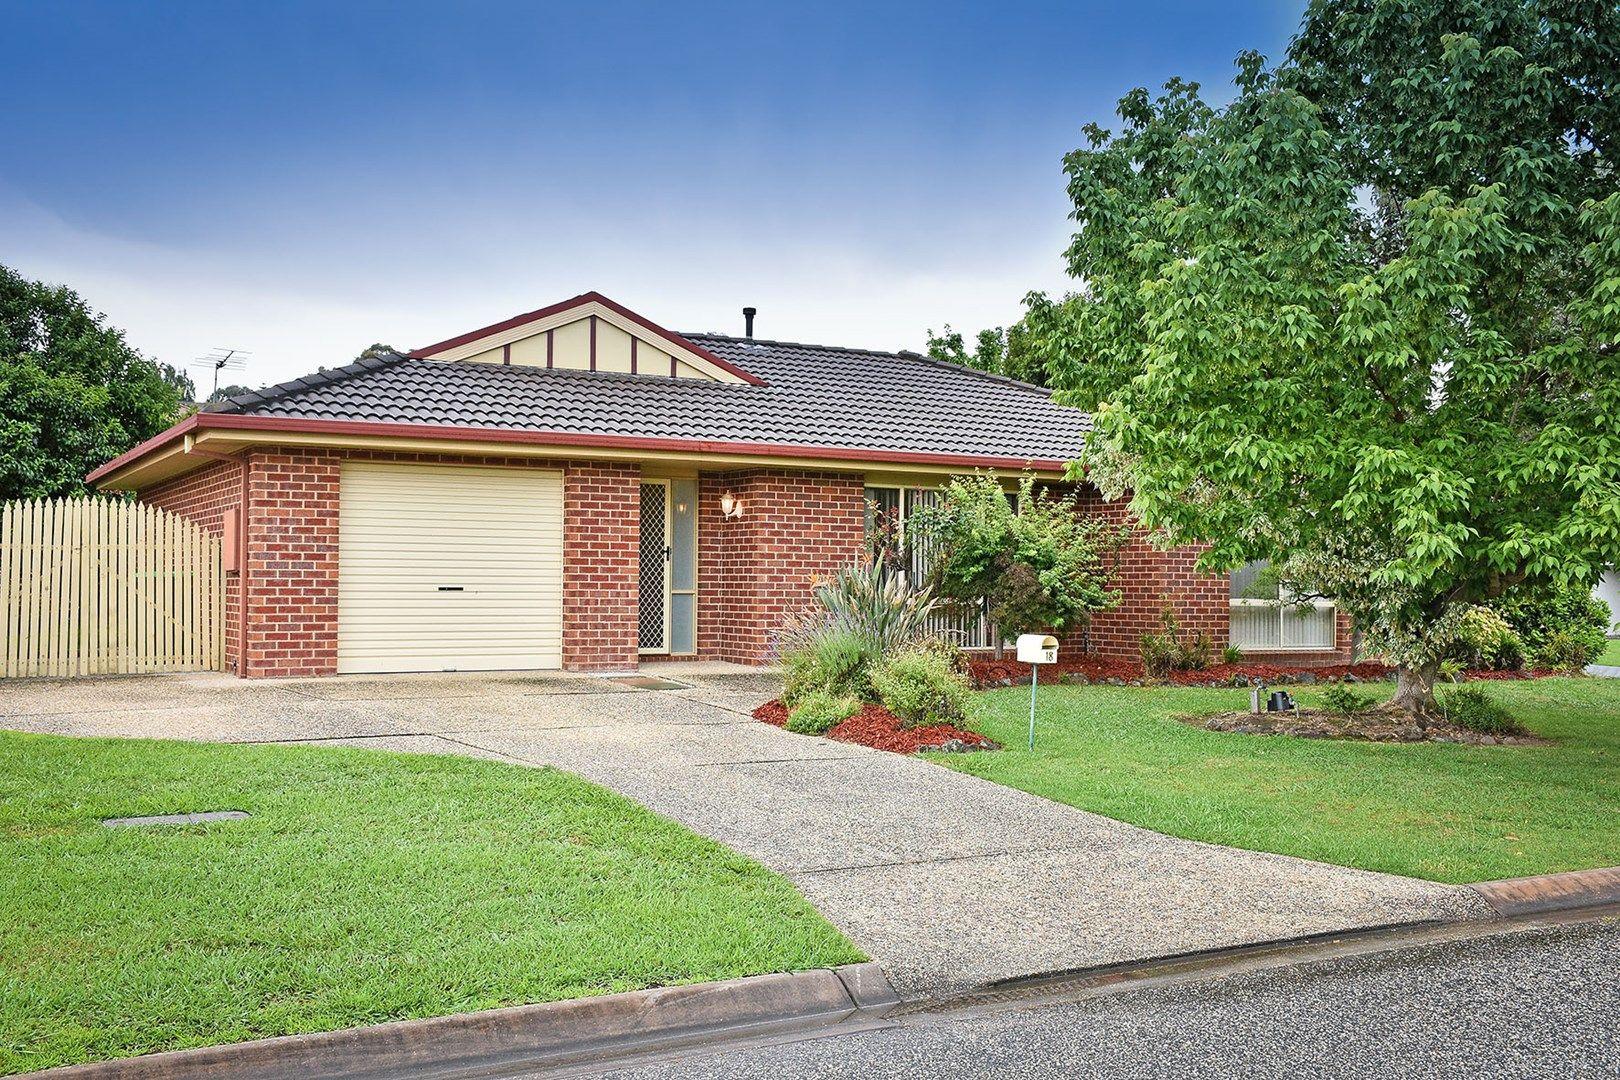 18 Creasey Place, Glenroy NSW 2640, Image 0